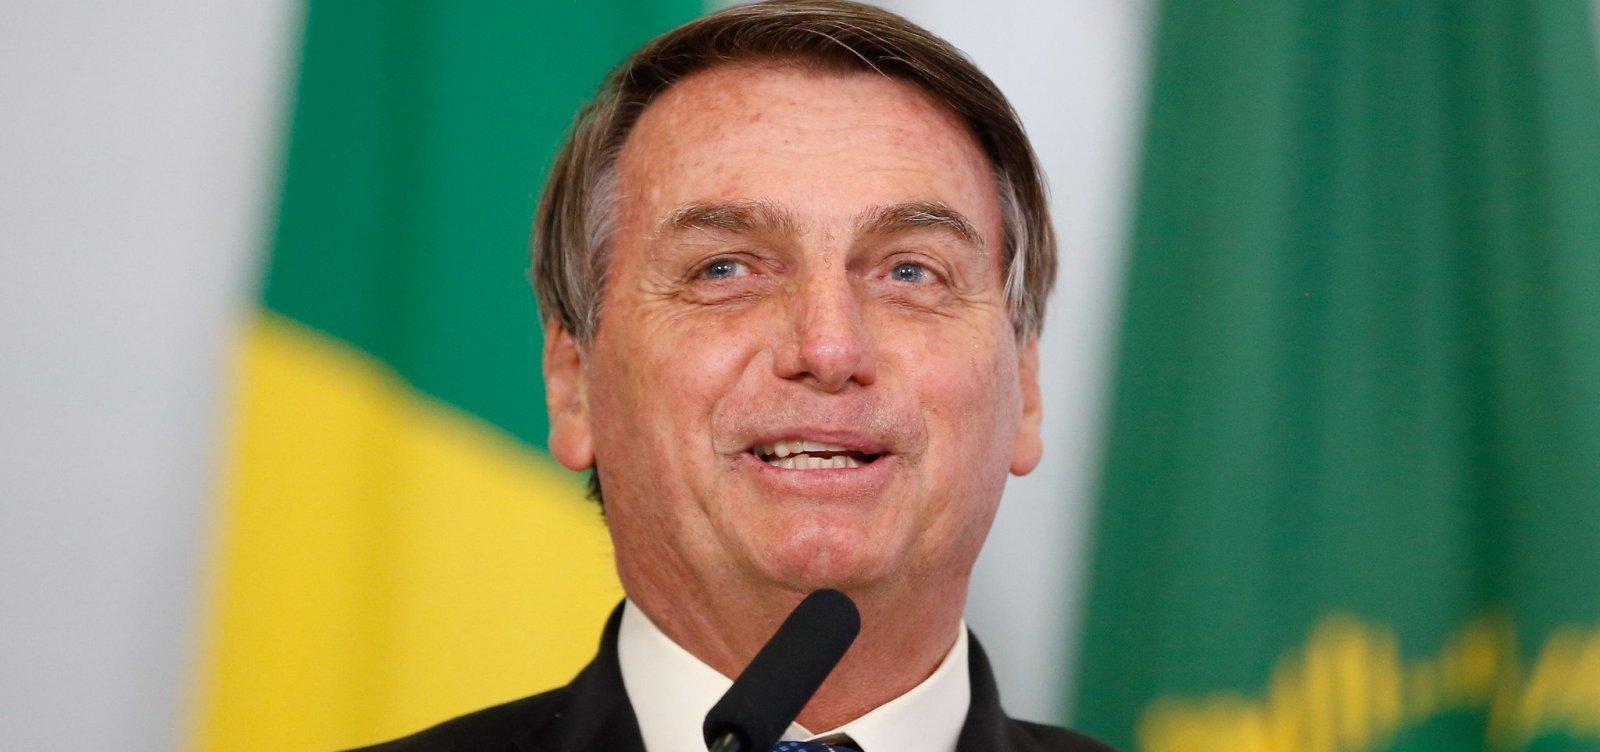 """Ivermectina mata bichas"", diz Bolsonaro em vídeo exibido na CPI"